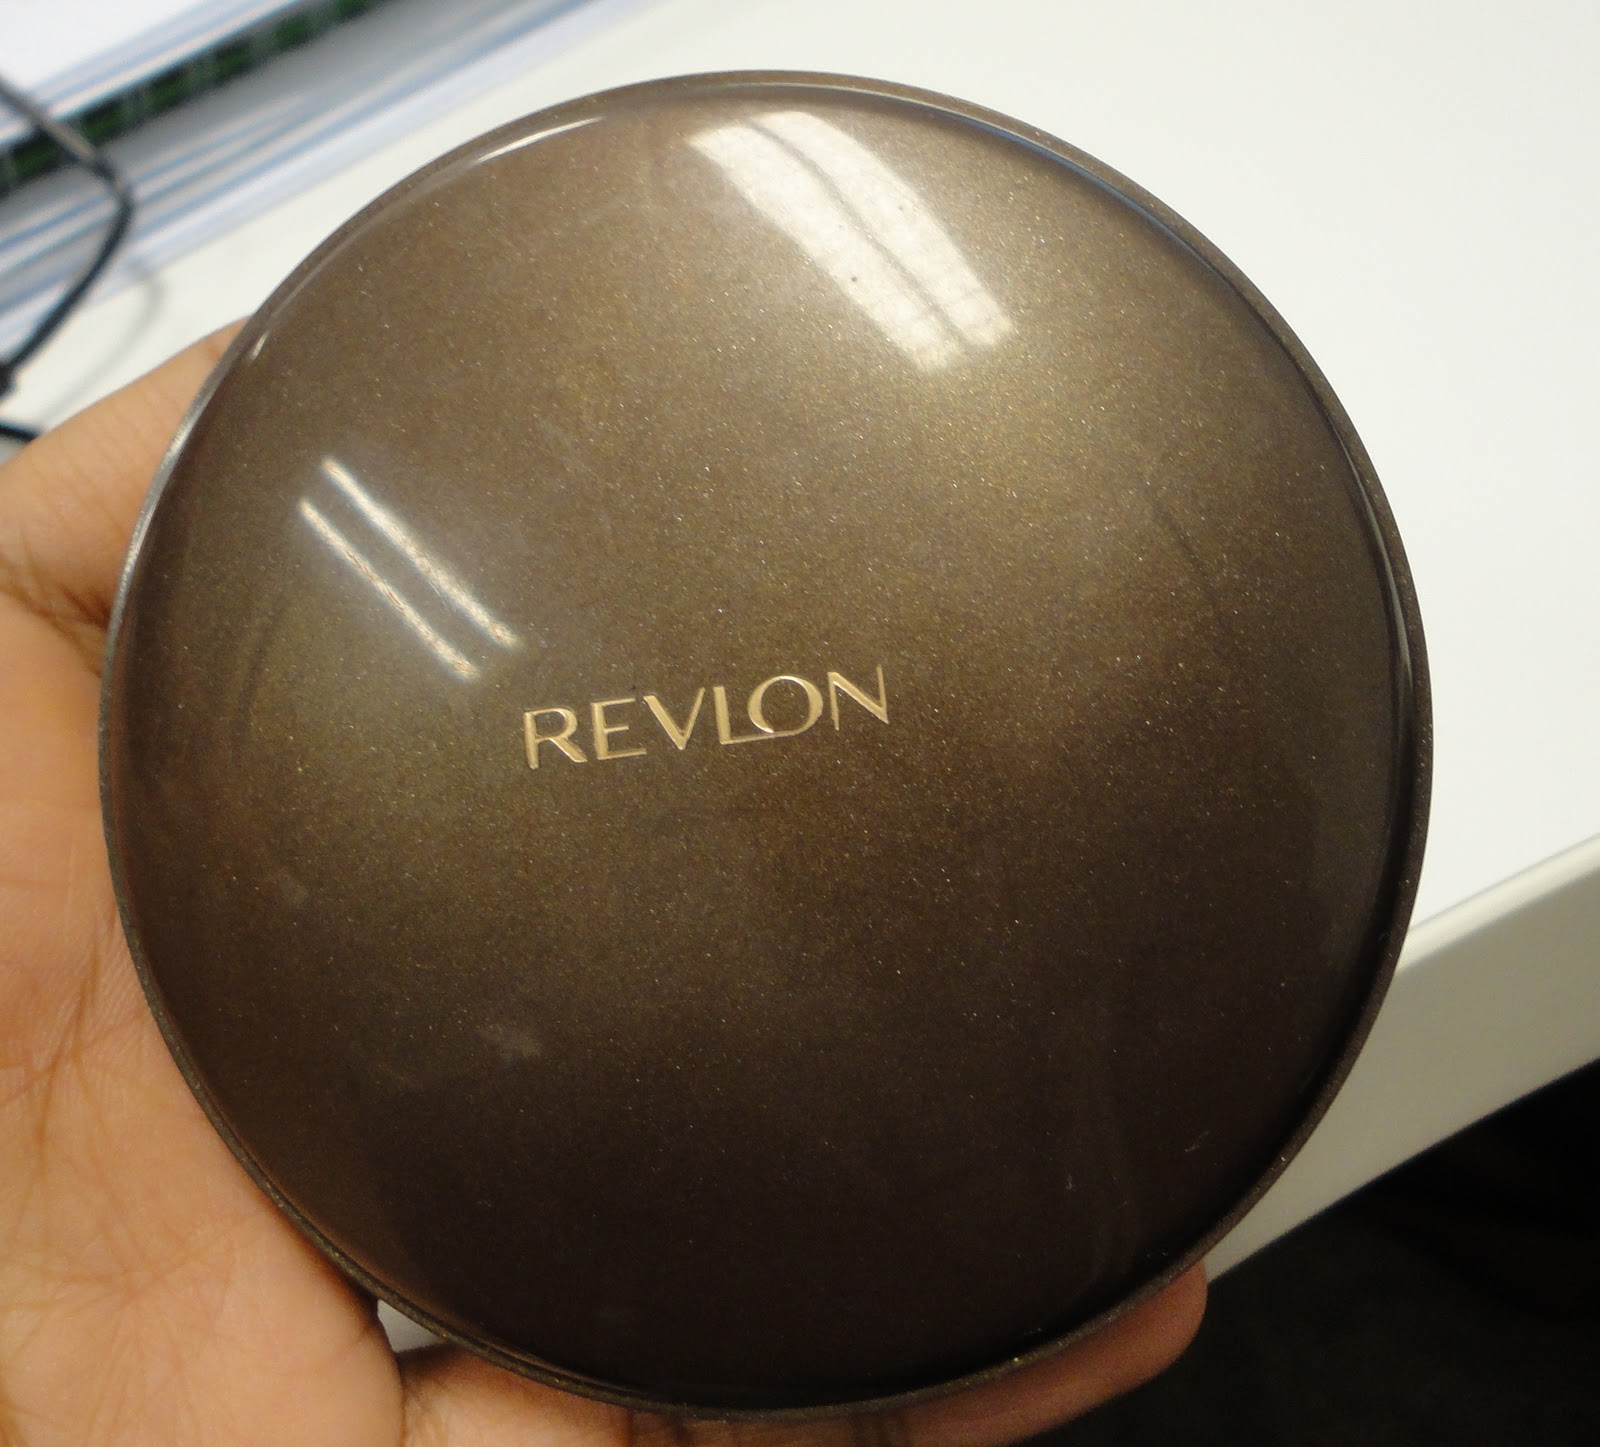 how to use revlon foundation